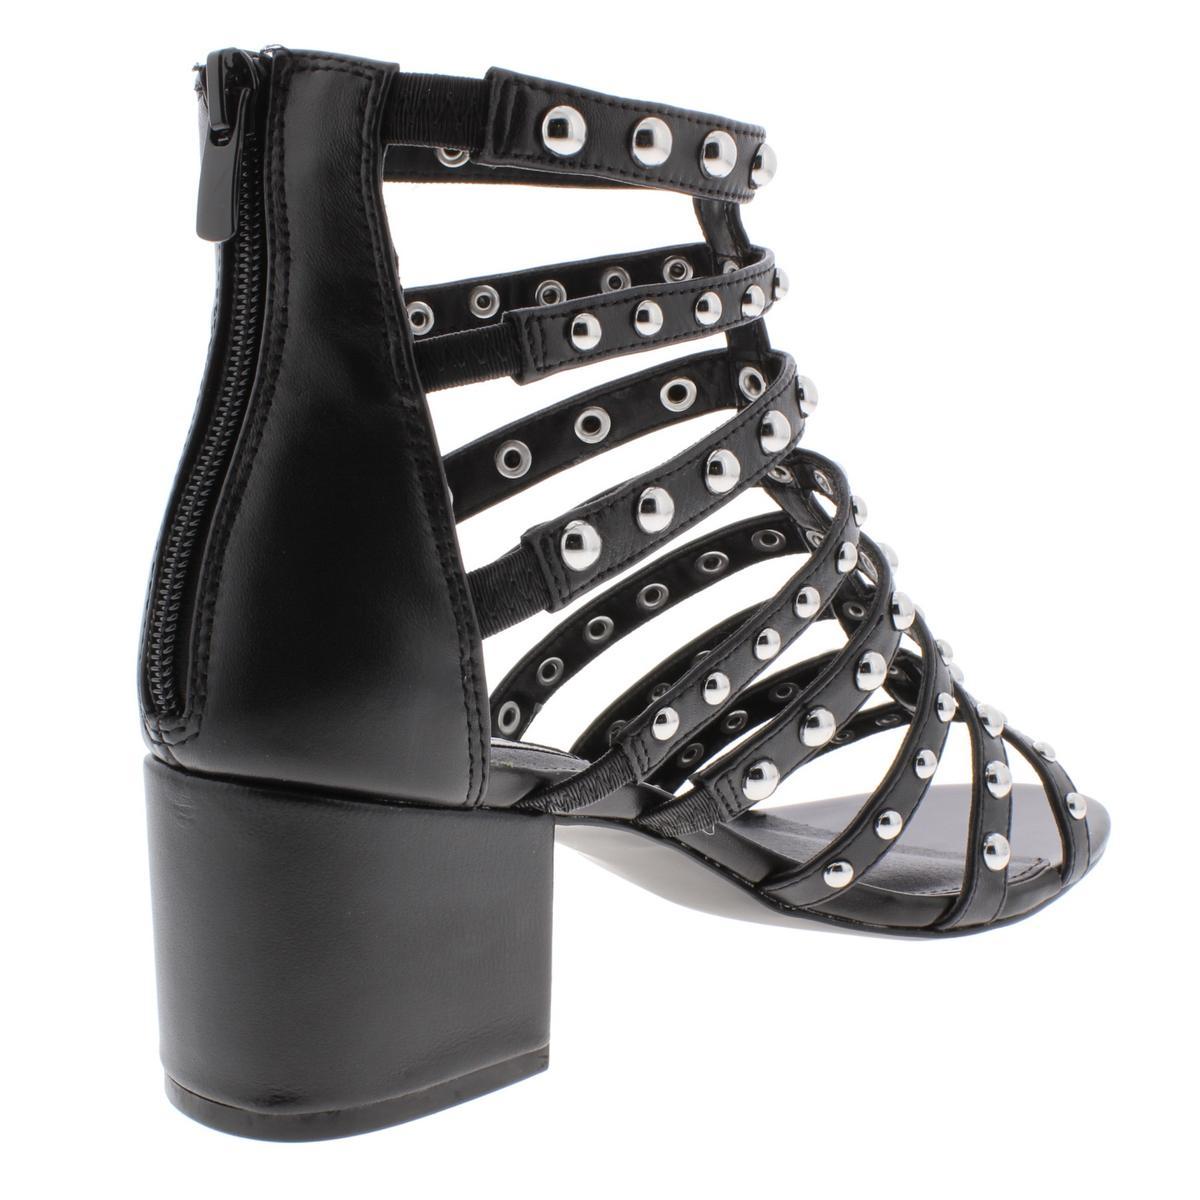 Steve Madden donna Mania Studded Strappy Strappy Strappy Gladiator Sandals scarpe BHFO 7521 553a8f